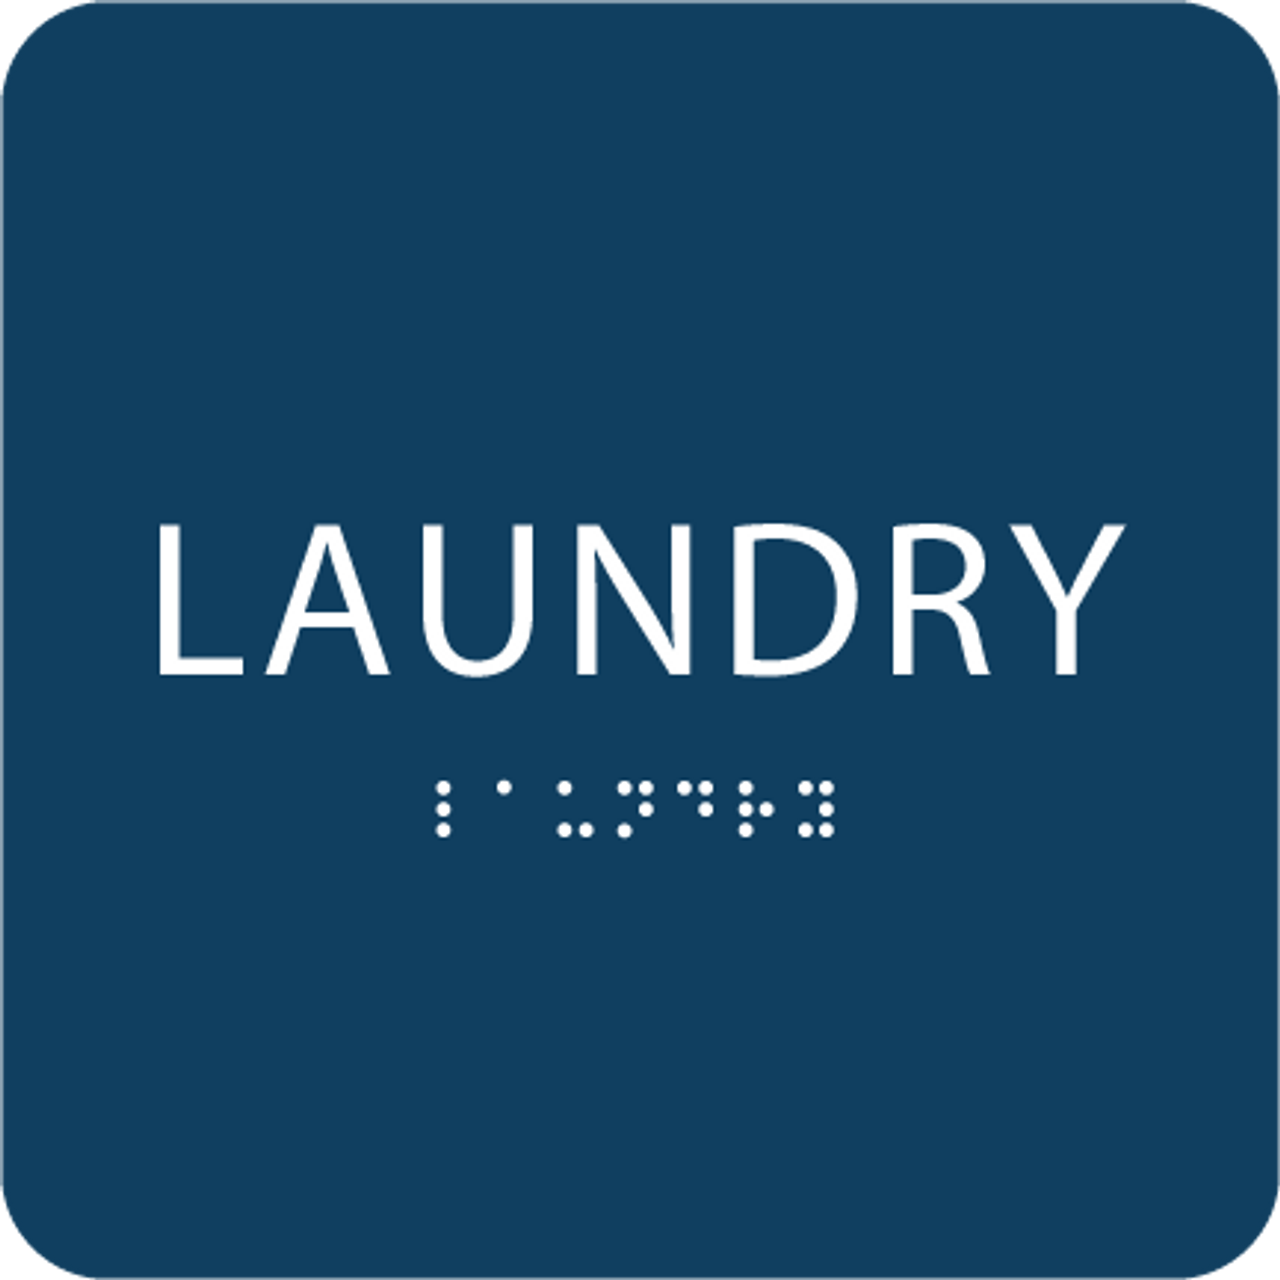 Blue Laundry ADA Sign